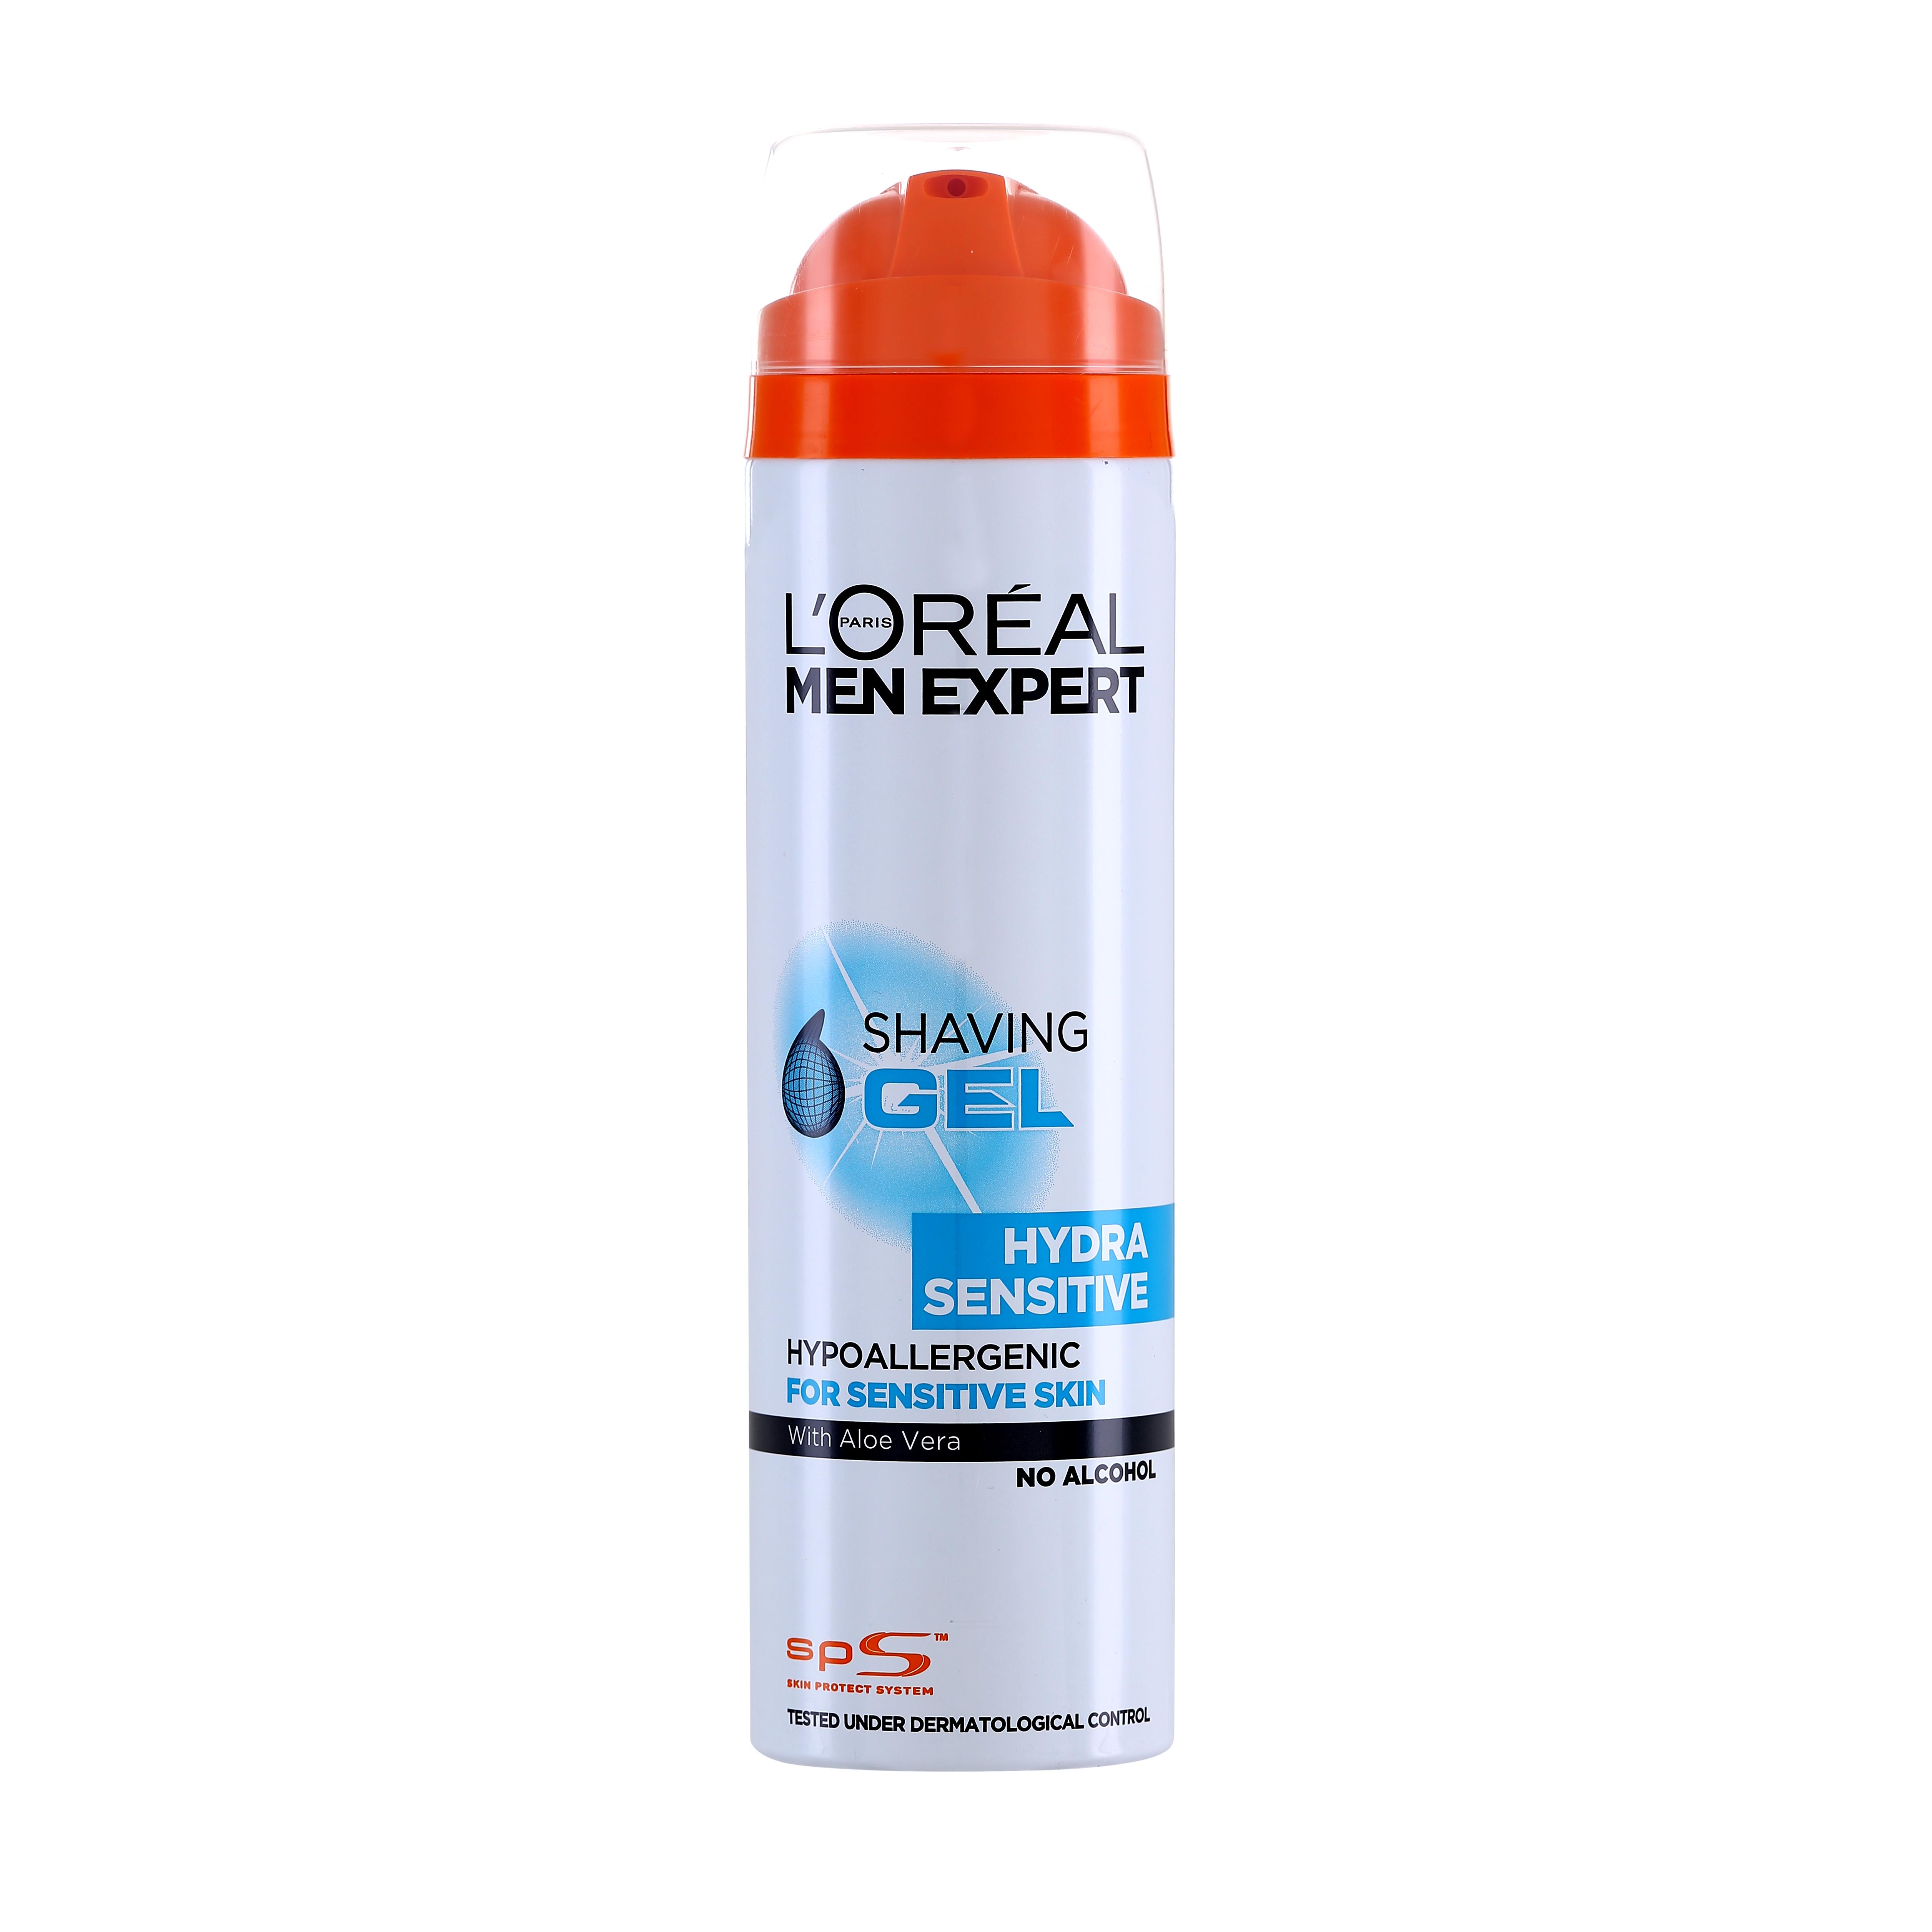 L'Oréal - Hydra Sensitive Shaving Gel 200 ml